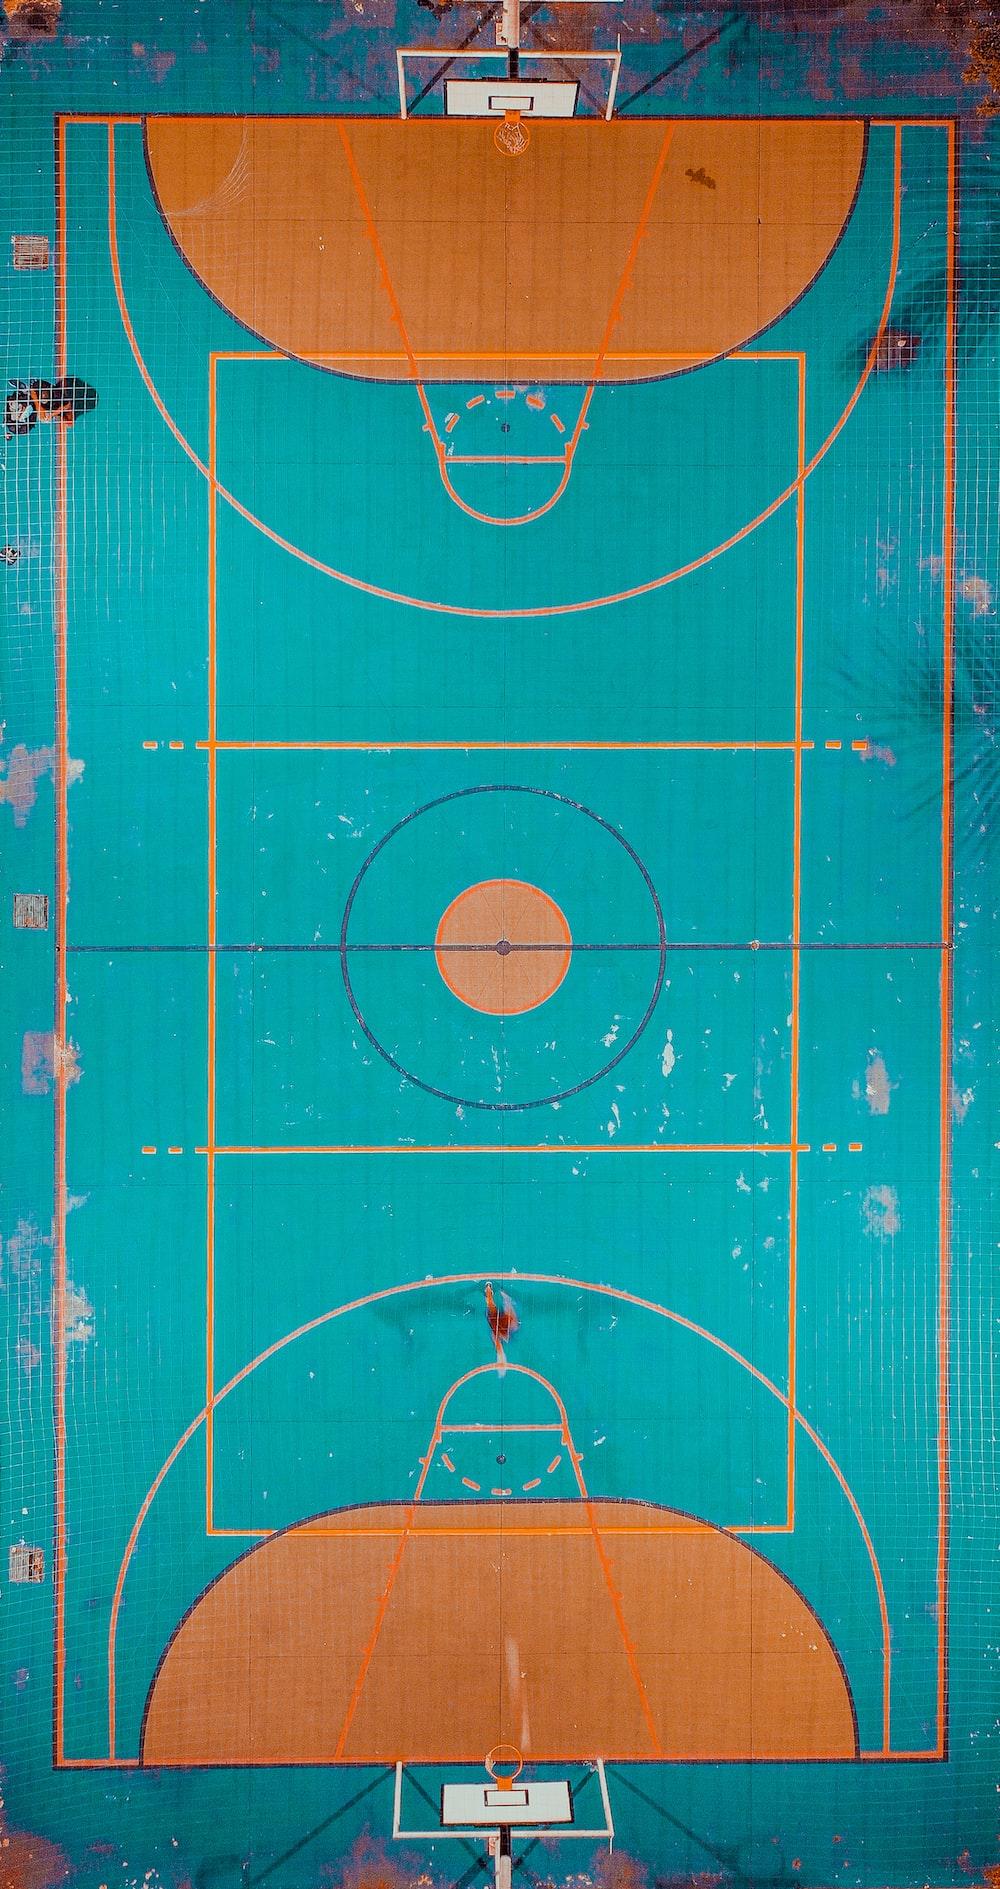 basketball court during daytime